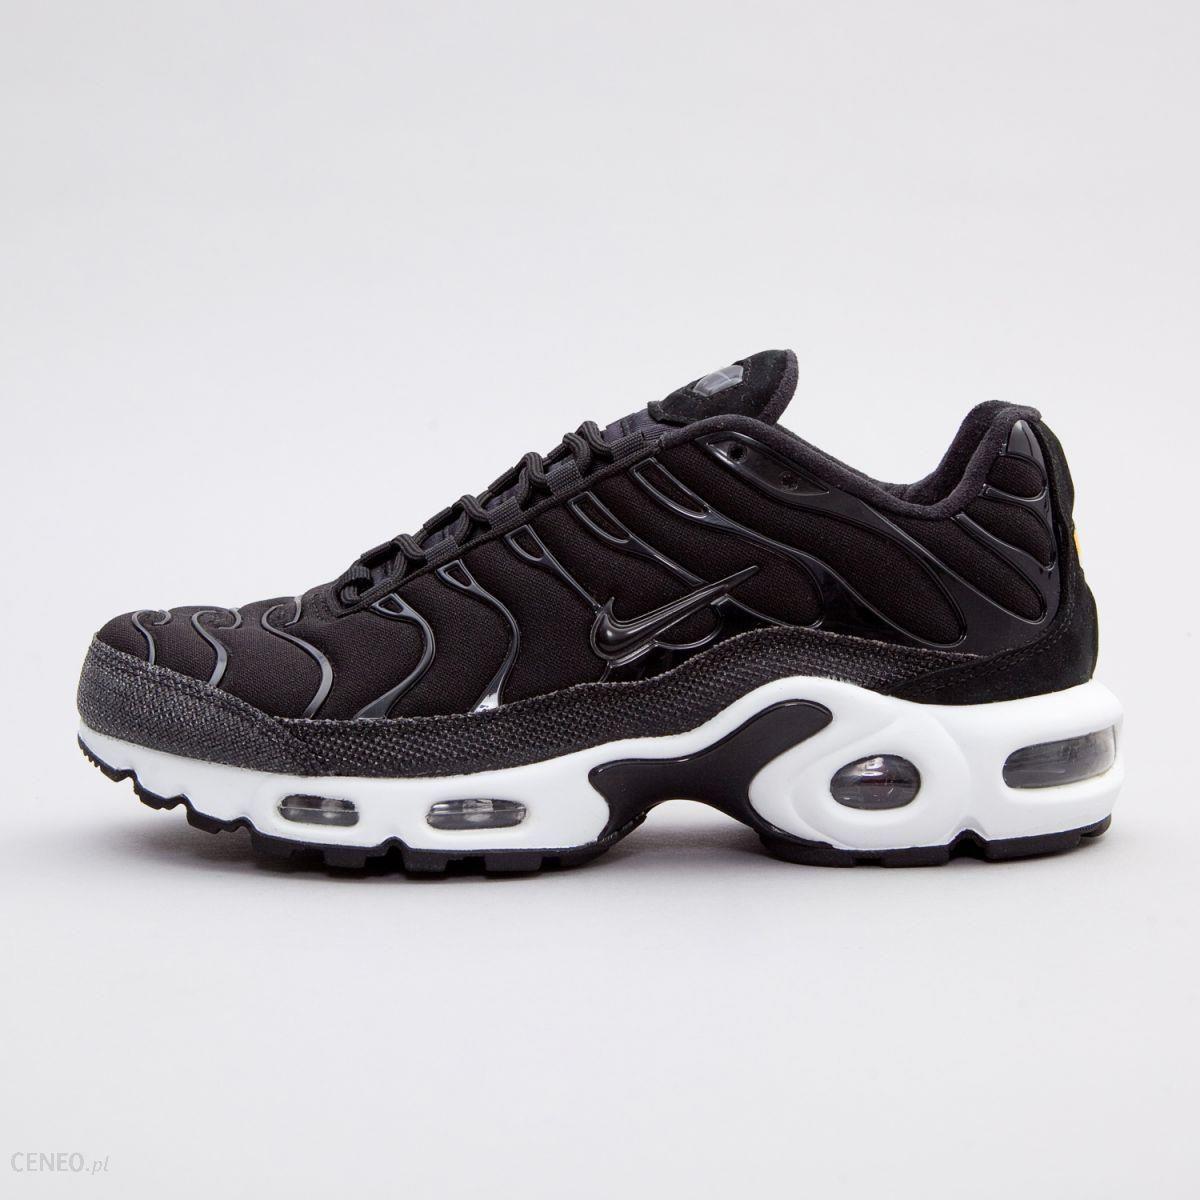 Buty damskie sneakersy Nike Wmns Air Max Plus Premium 848891